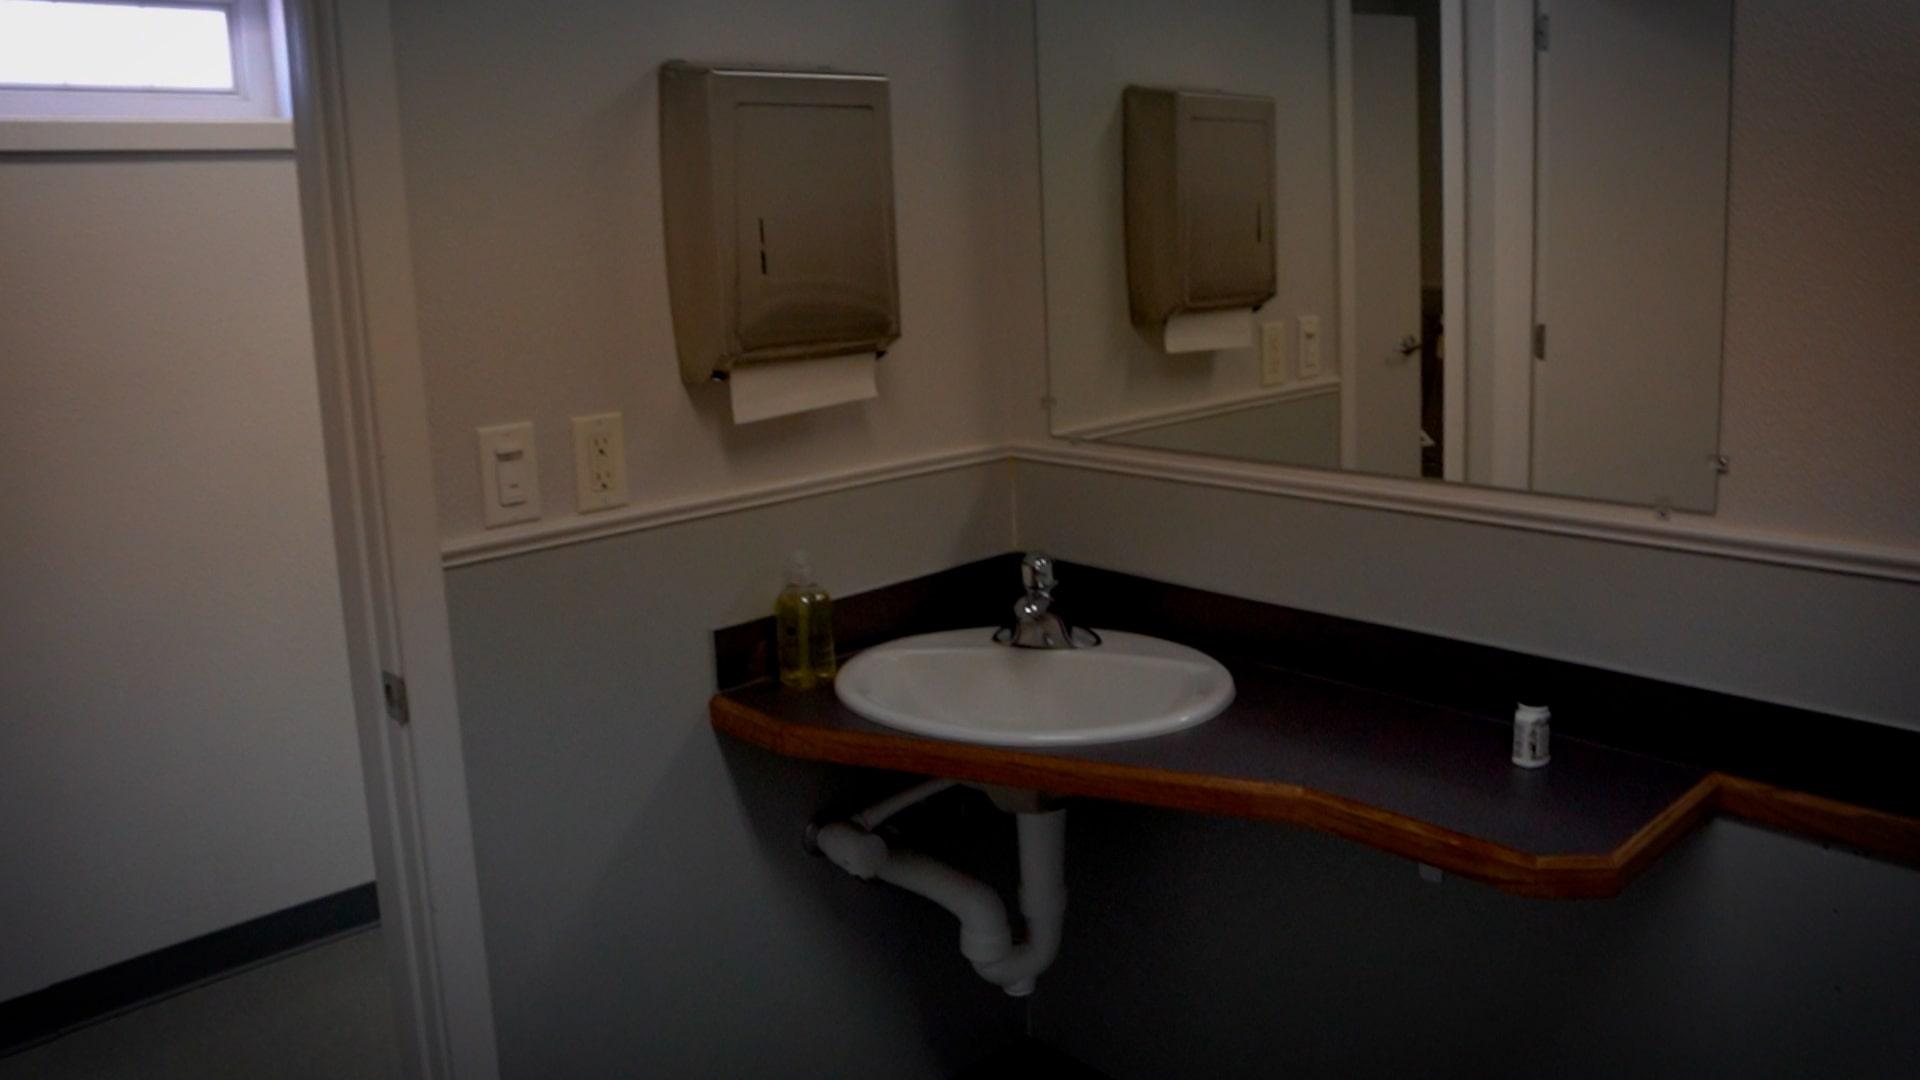 Simple Sink in the Girl's Comfort Room